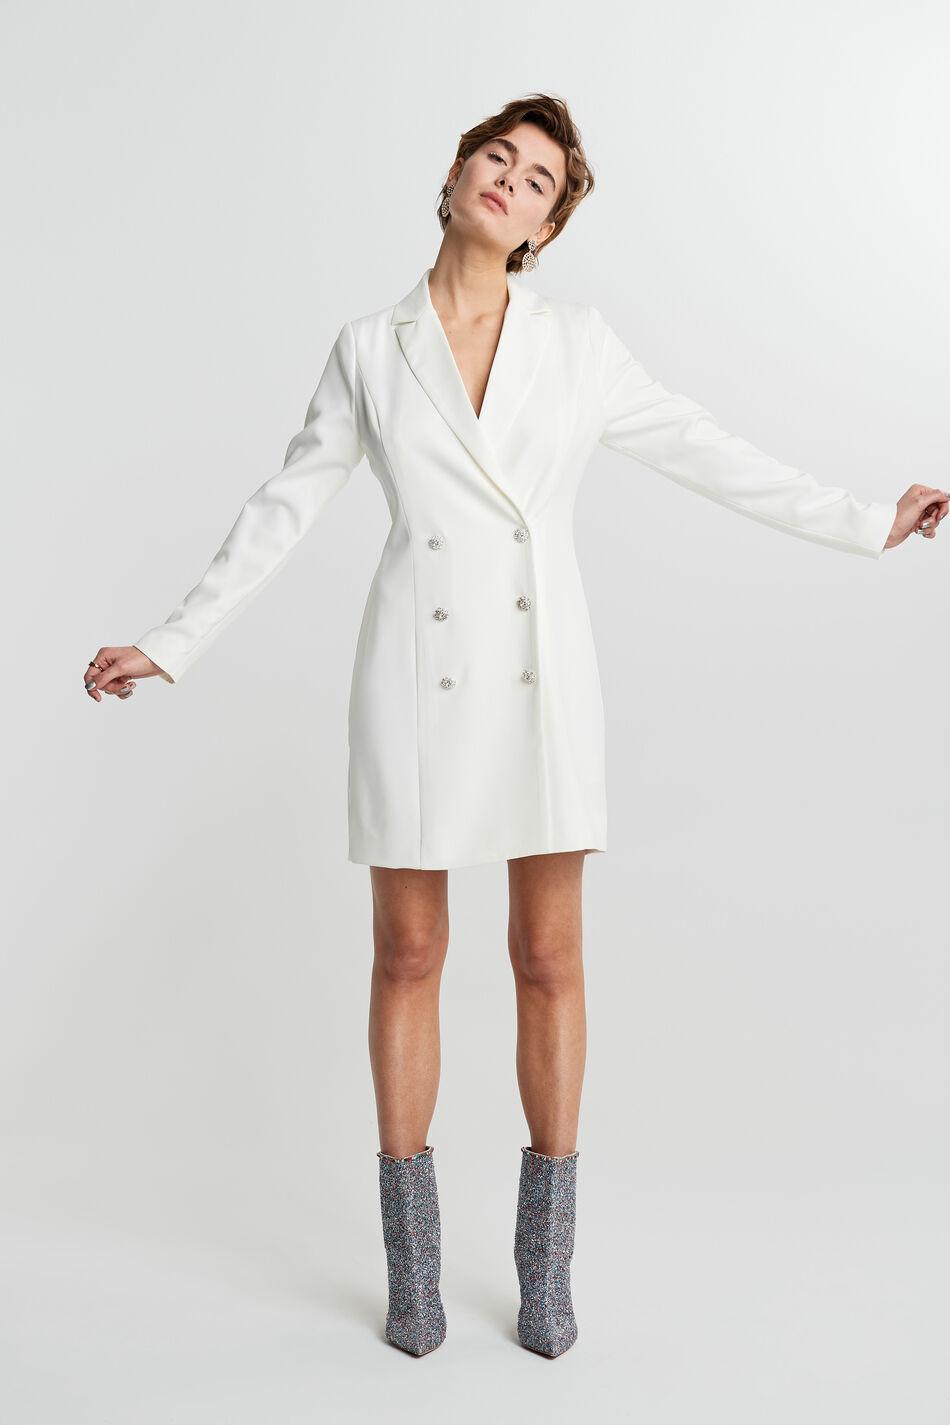 Gina Tricot Silvia blazer dress